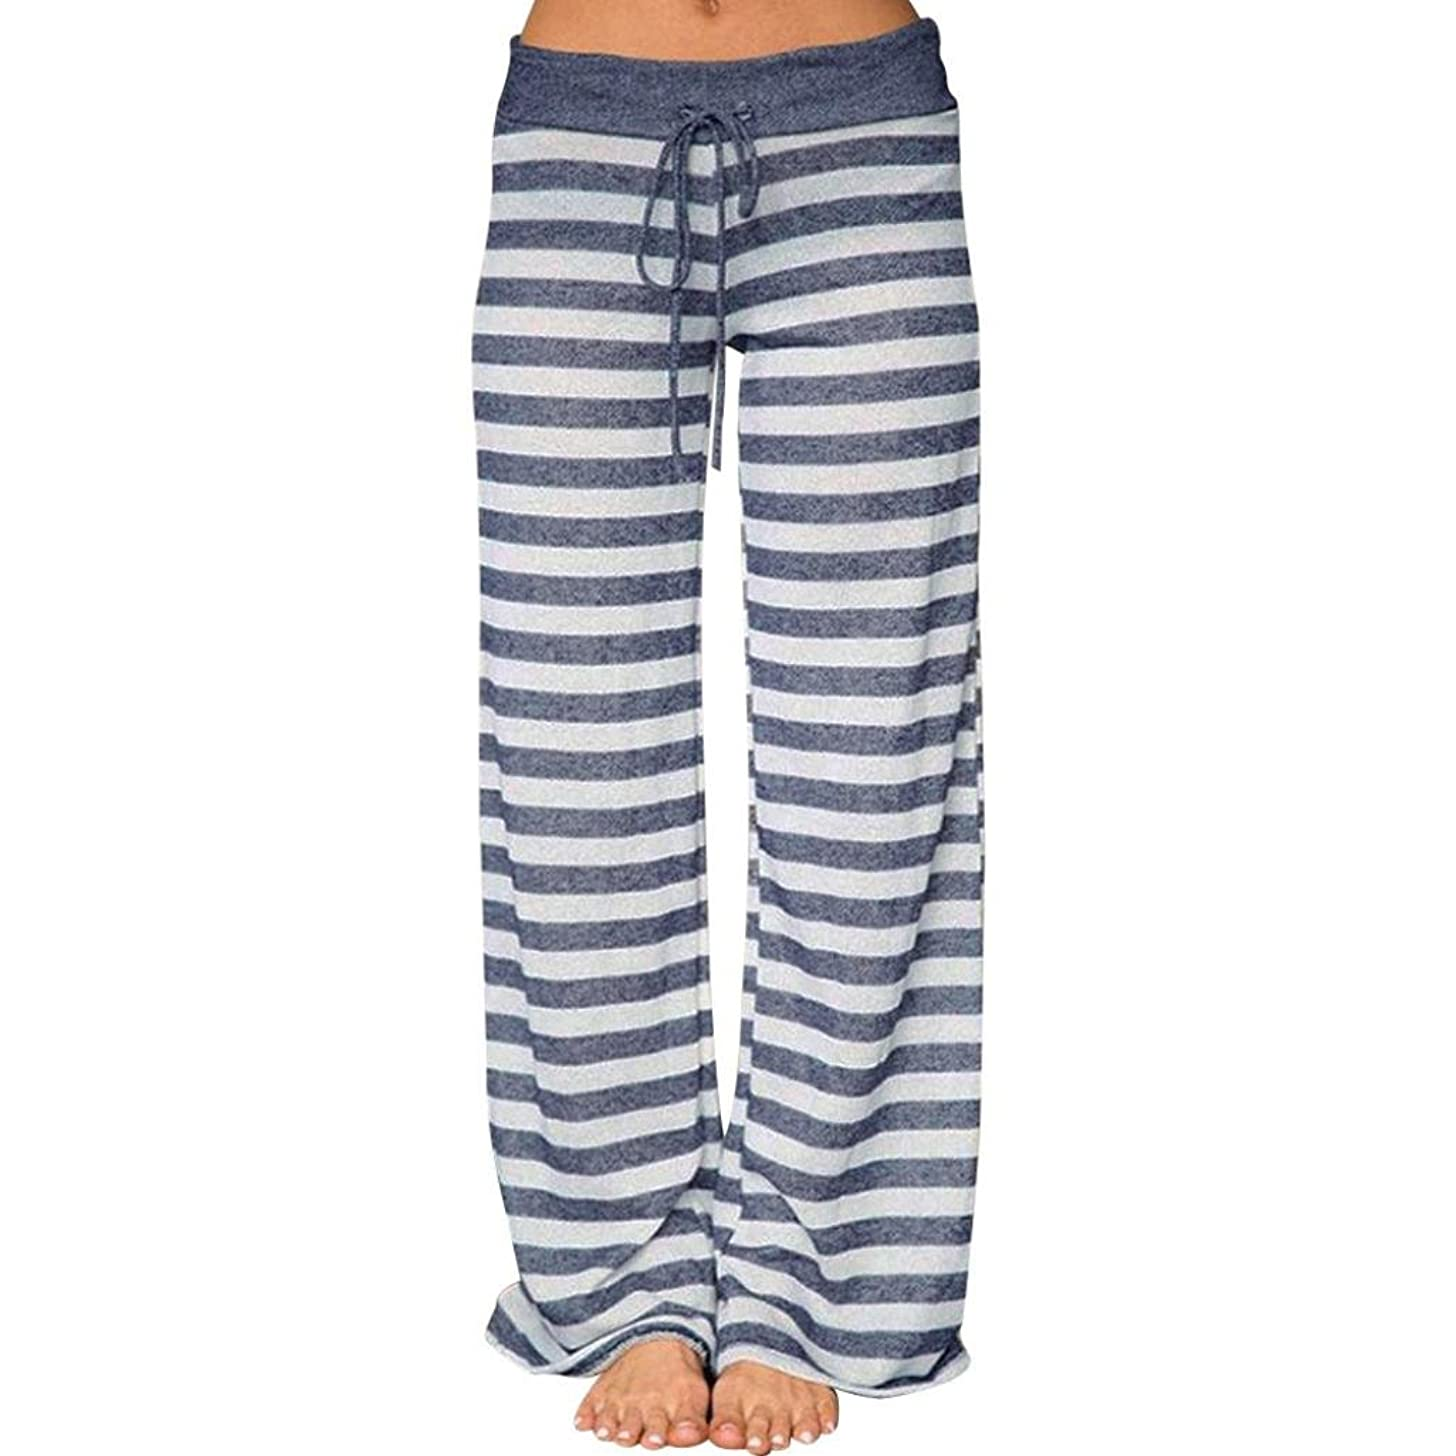 GoodLock Women Fashion Wide Leg Pants Ladies Summer Floral Prints Drawstring Wide Leg Pants Leggings